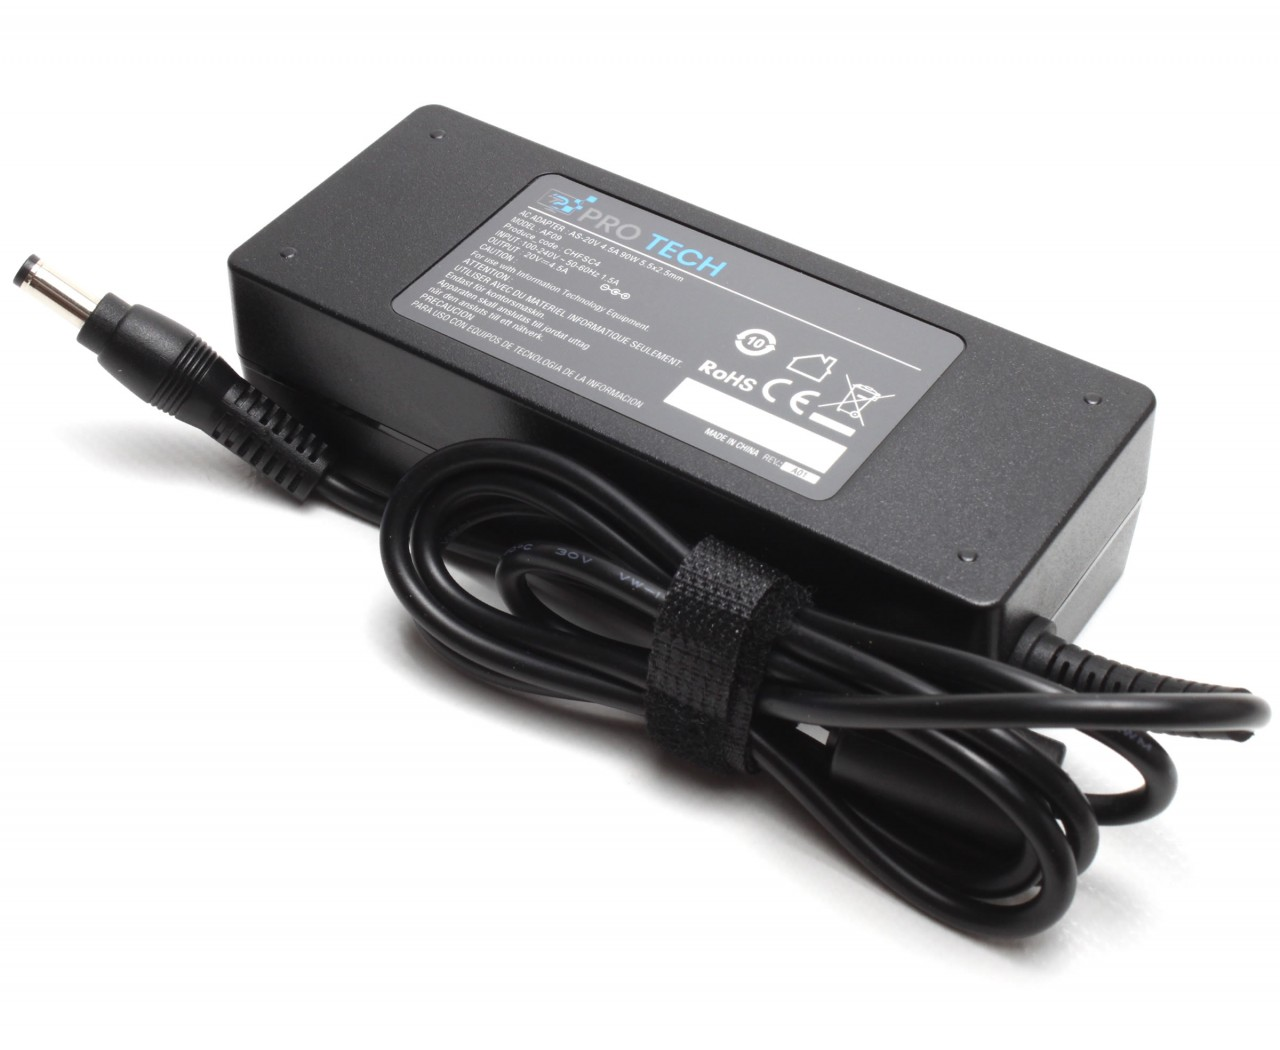 Incarcator Fujitsu Siemens FMV BIBLO NB75H T Replacement imagine powerlaptop.ro 2021